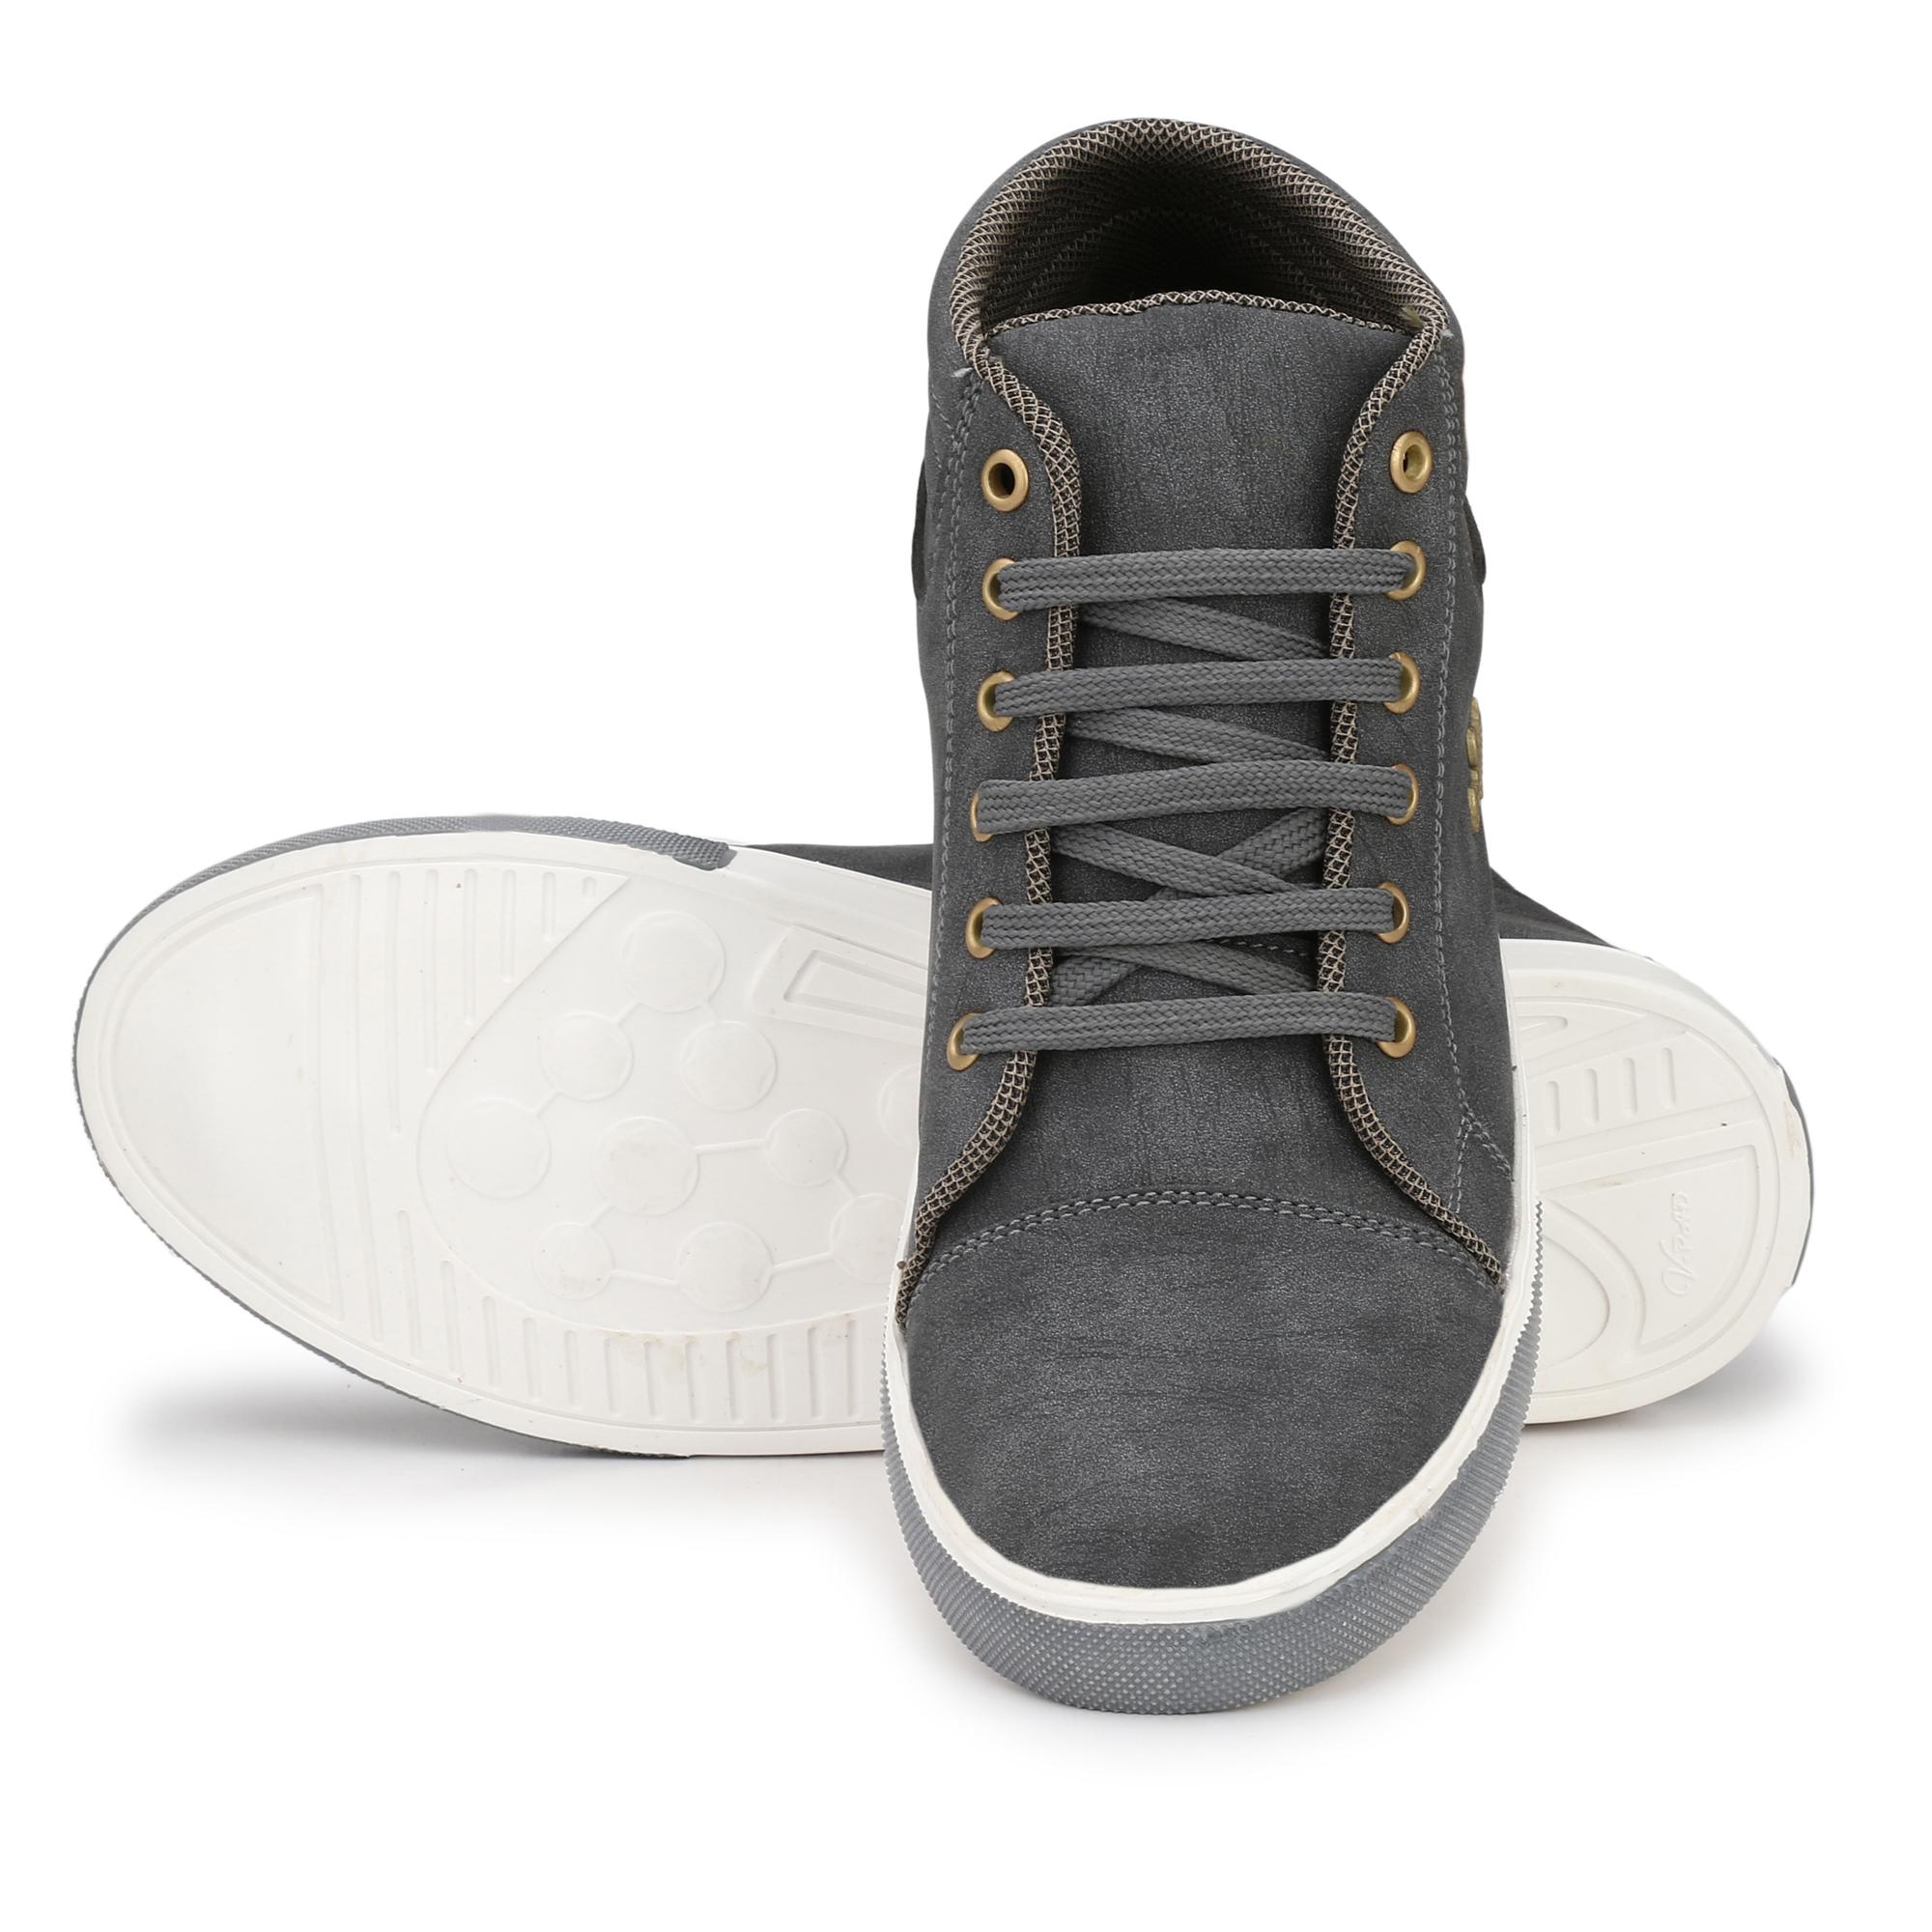 B.R.K. FOOTWEAR-061